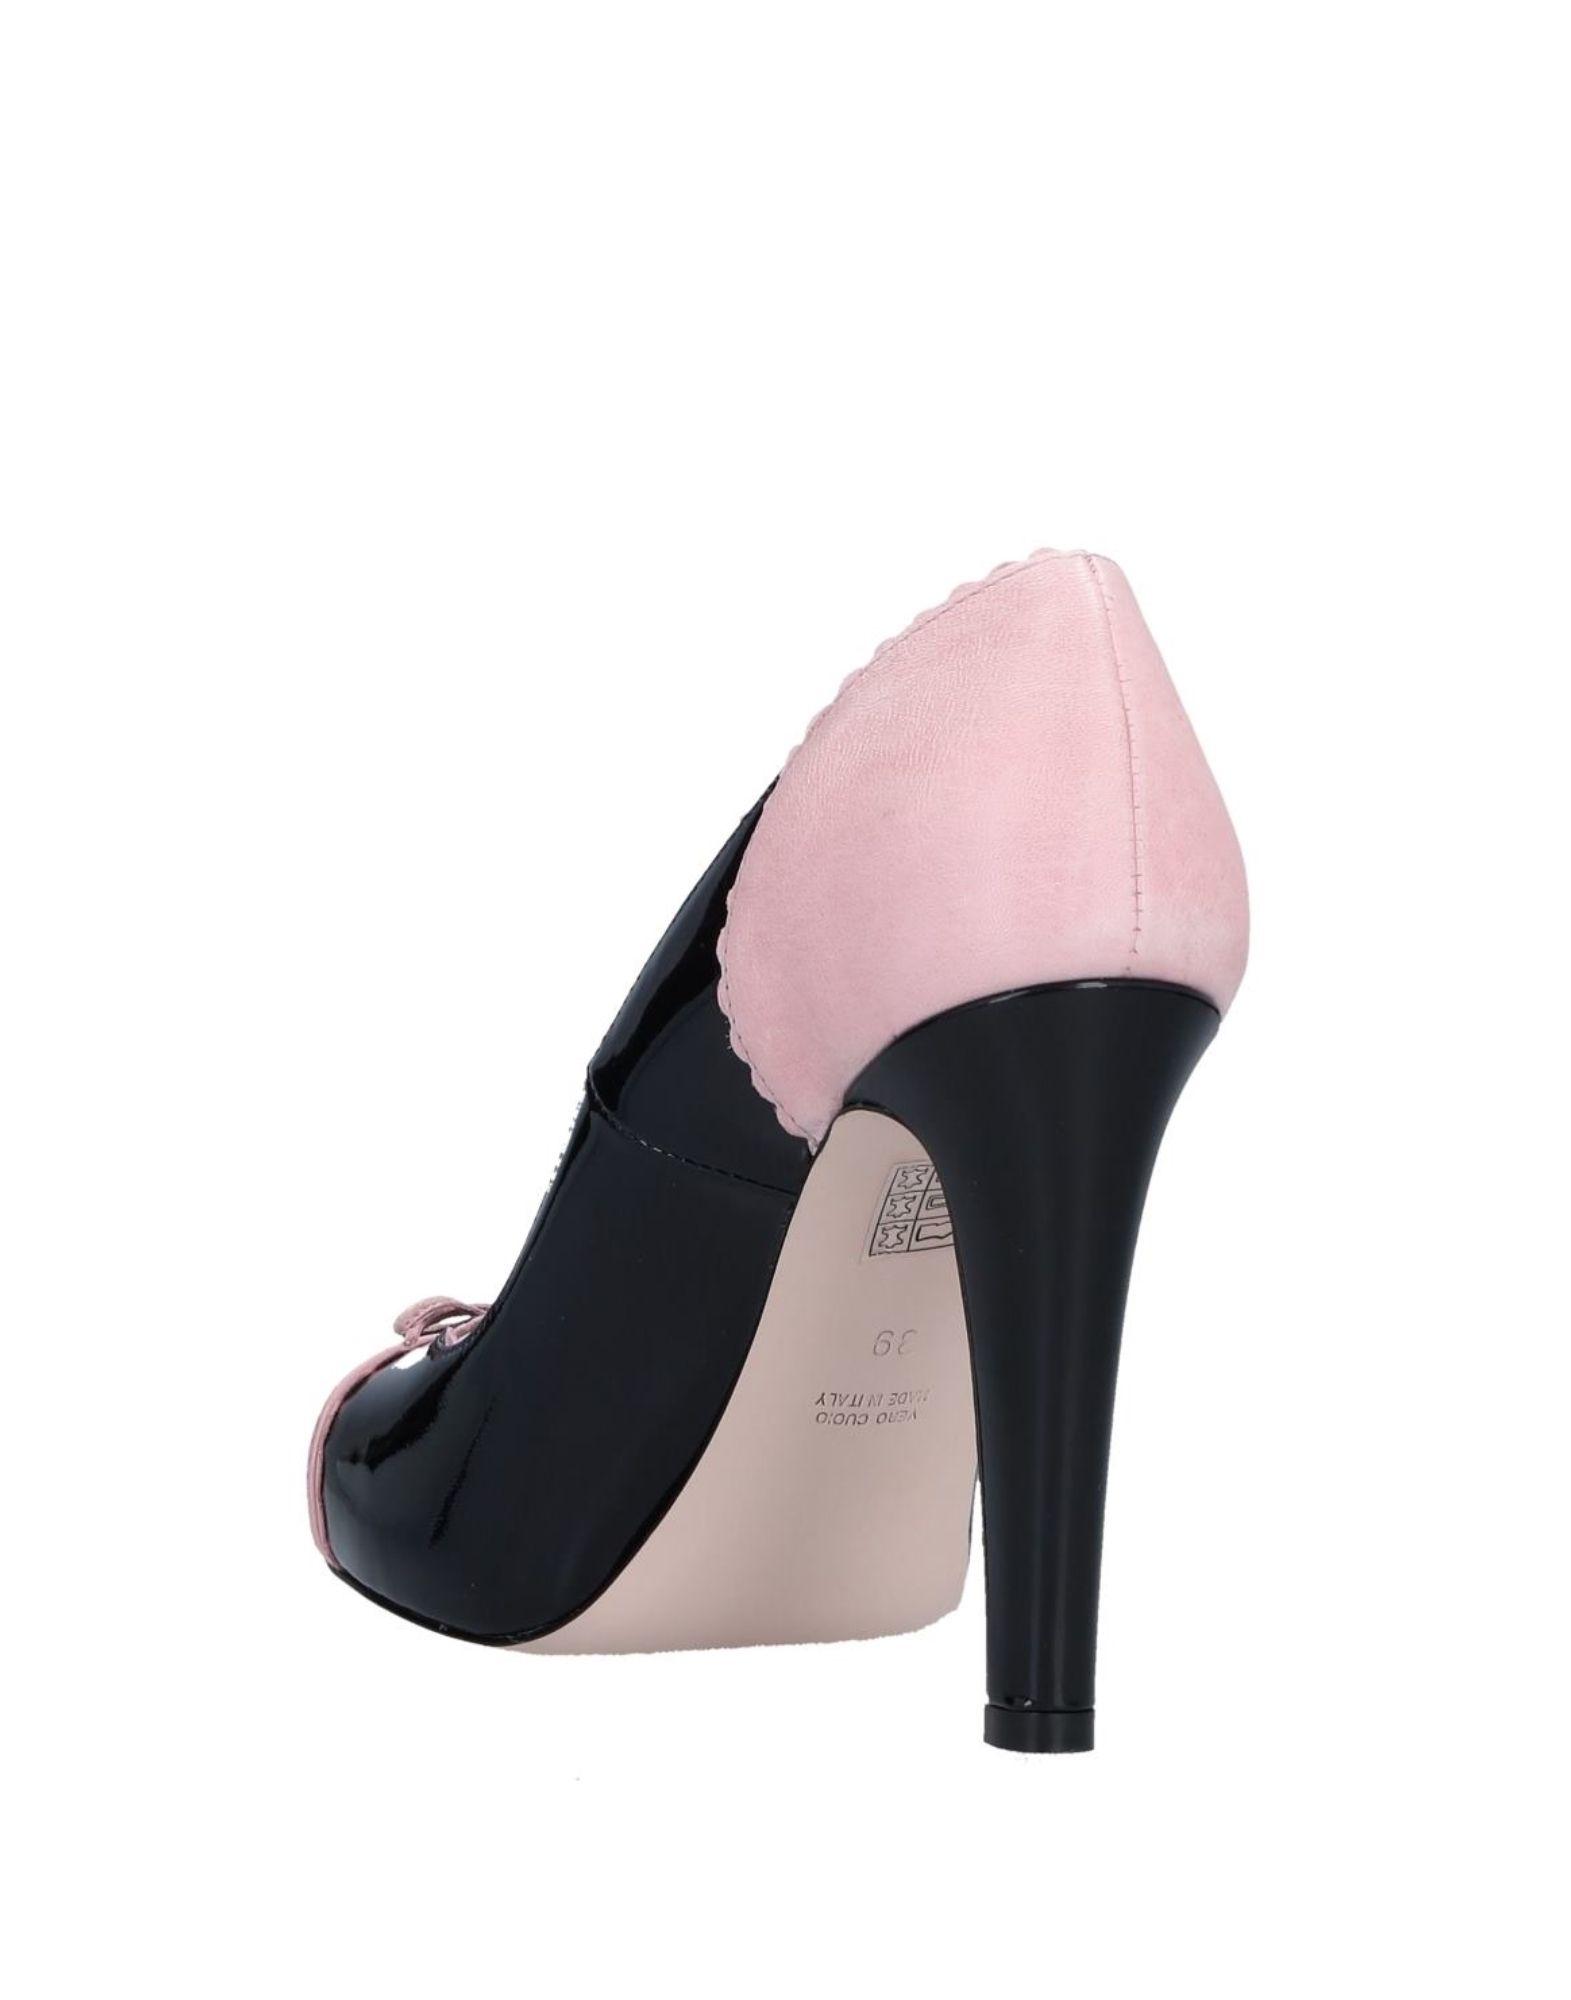 Stilvolle Damen billige Schuhe Red(V) Pumps Damen Stilvolle  11527625UO a27f4a